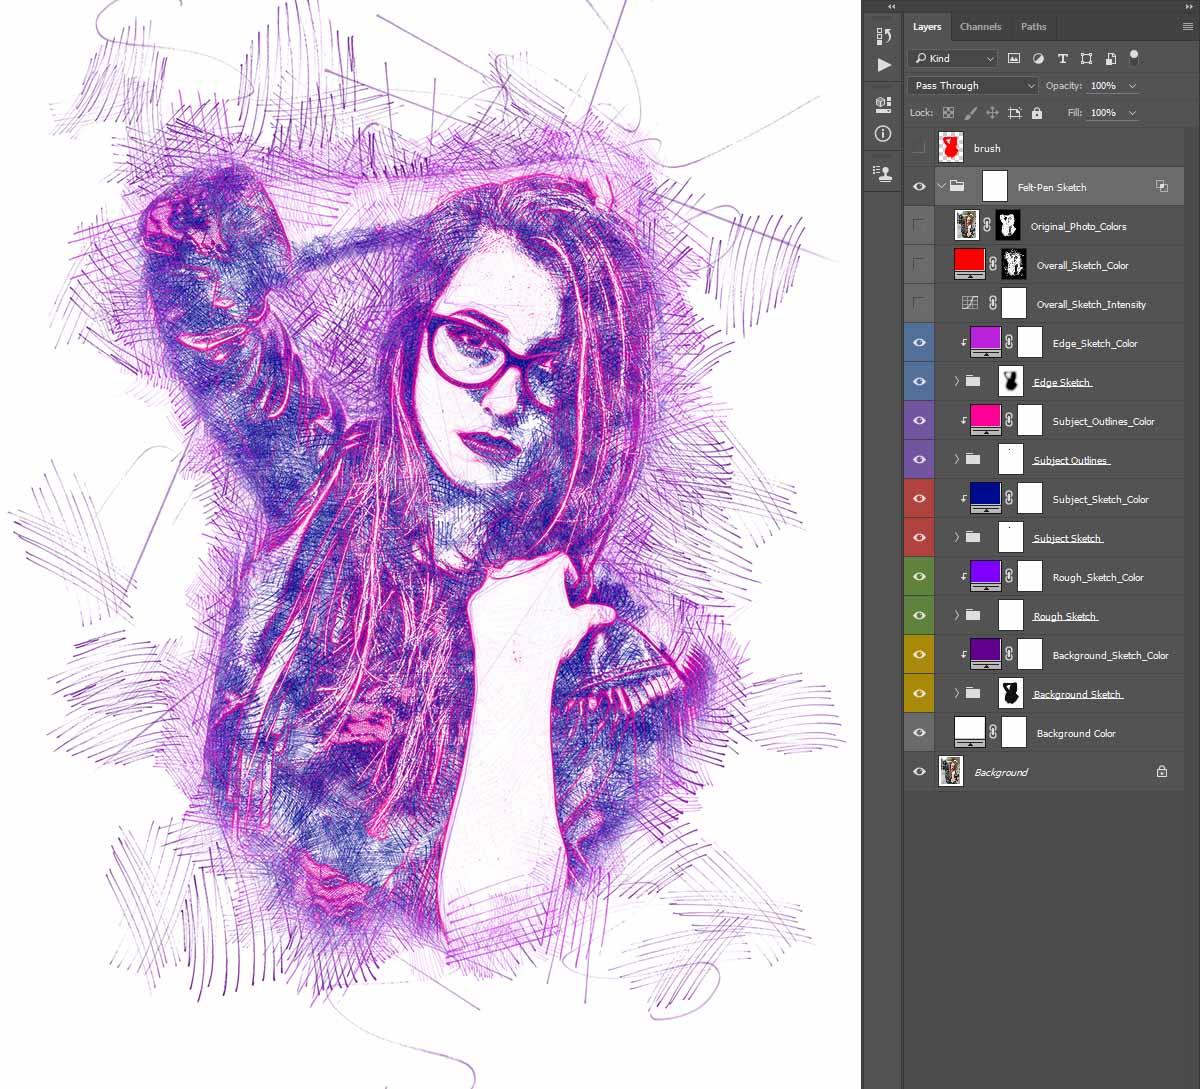 Customizing-the-Effect Felt-Pen Sketch Photoshop Action